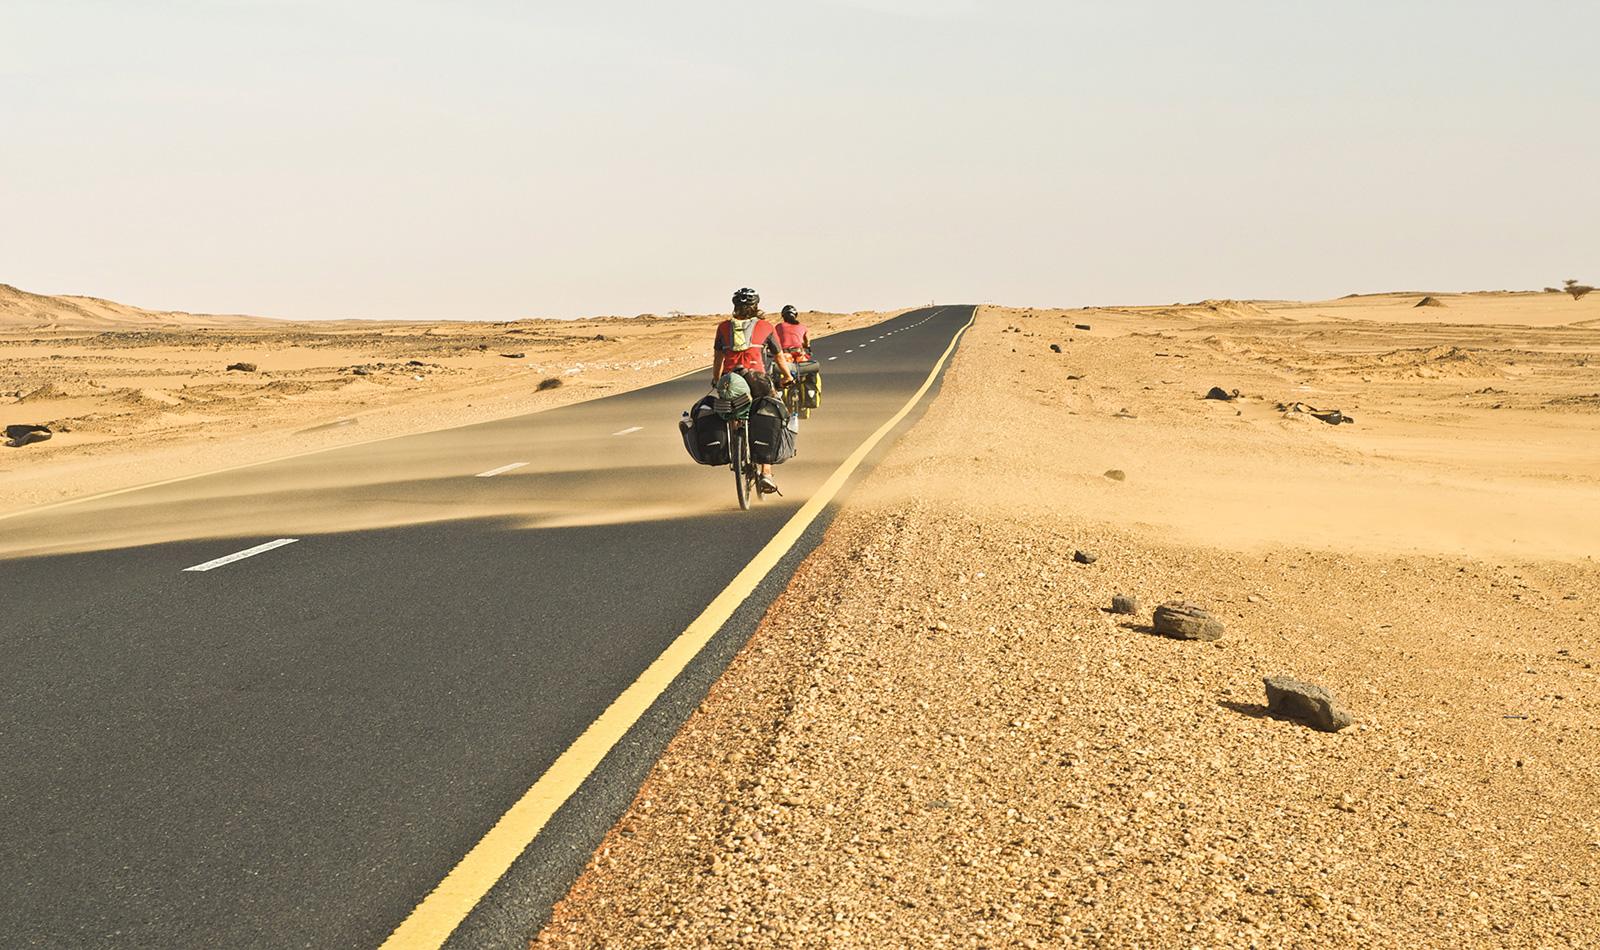 Sudan - Photo by Tom Perkins